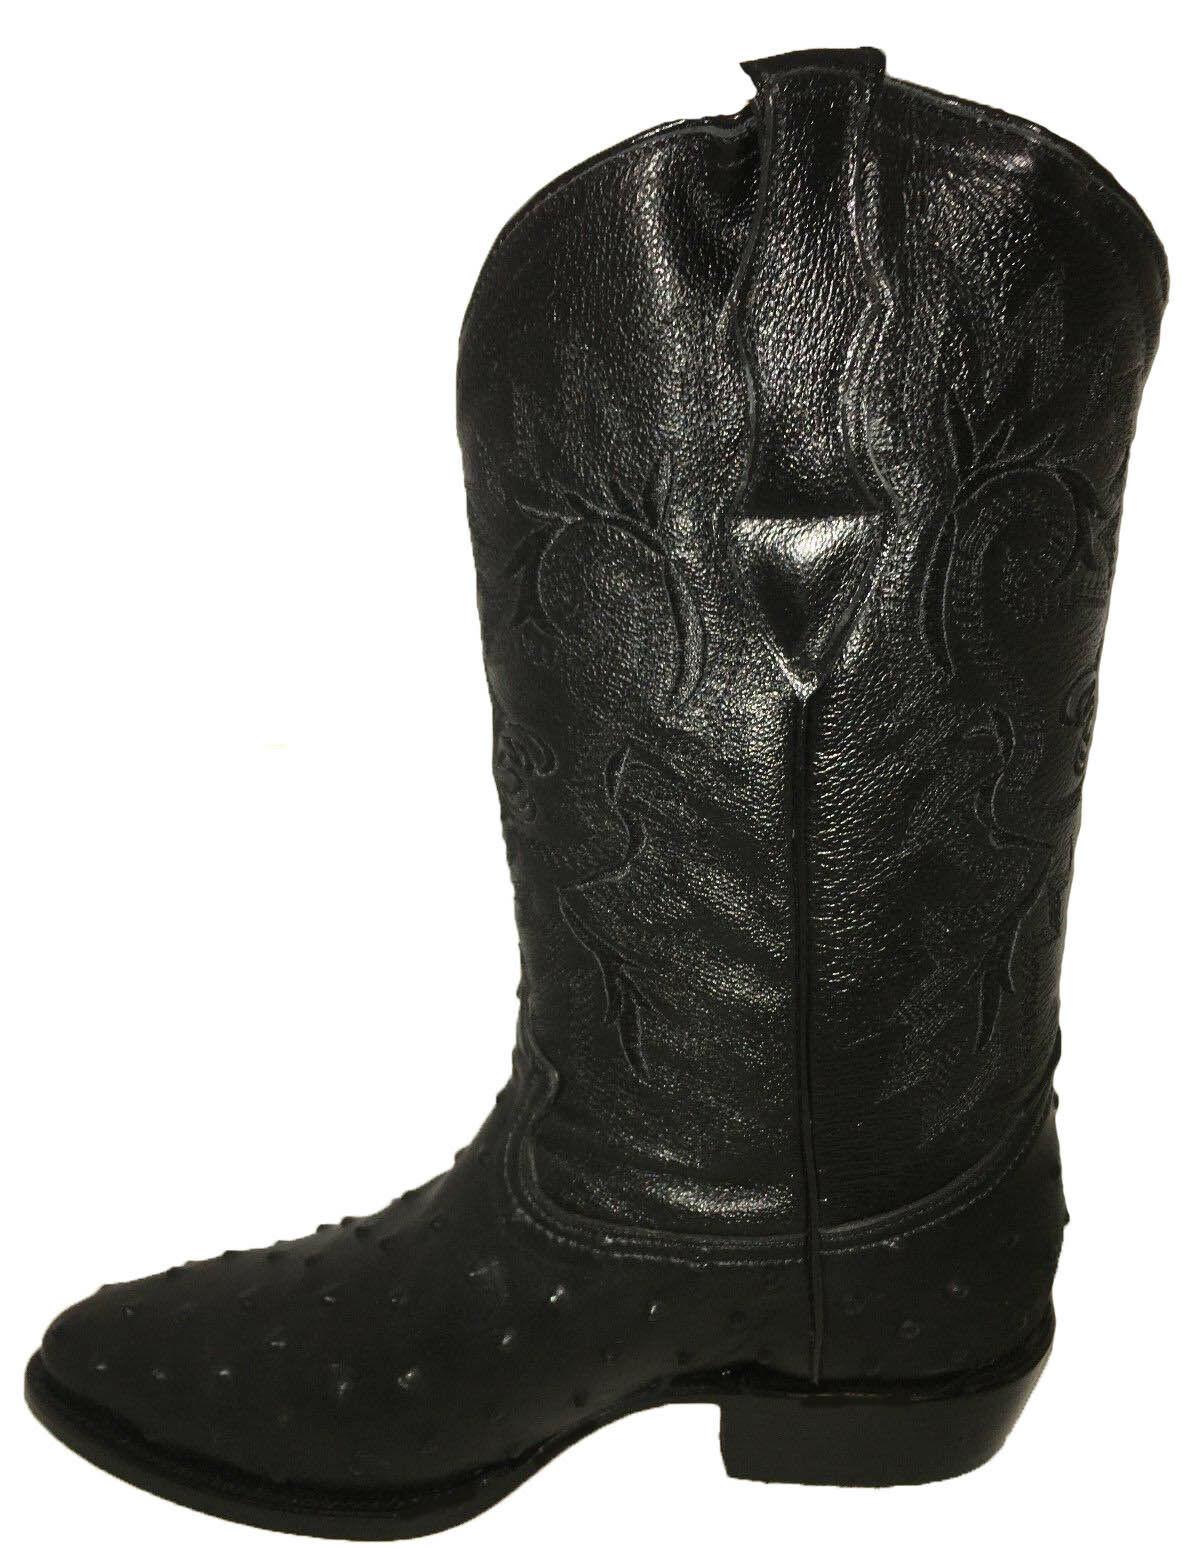 290be3146b2 Men's Cowboy Boots Ostrich Print Leather Western Rodeo Botas Liga de  Avestruz